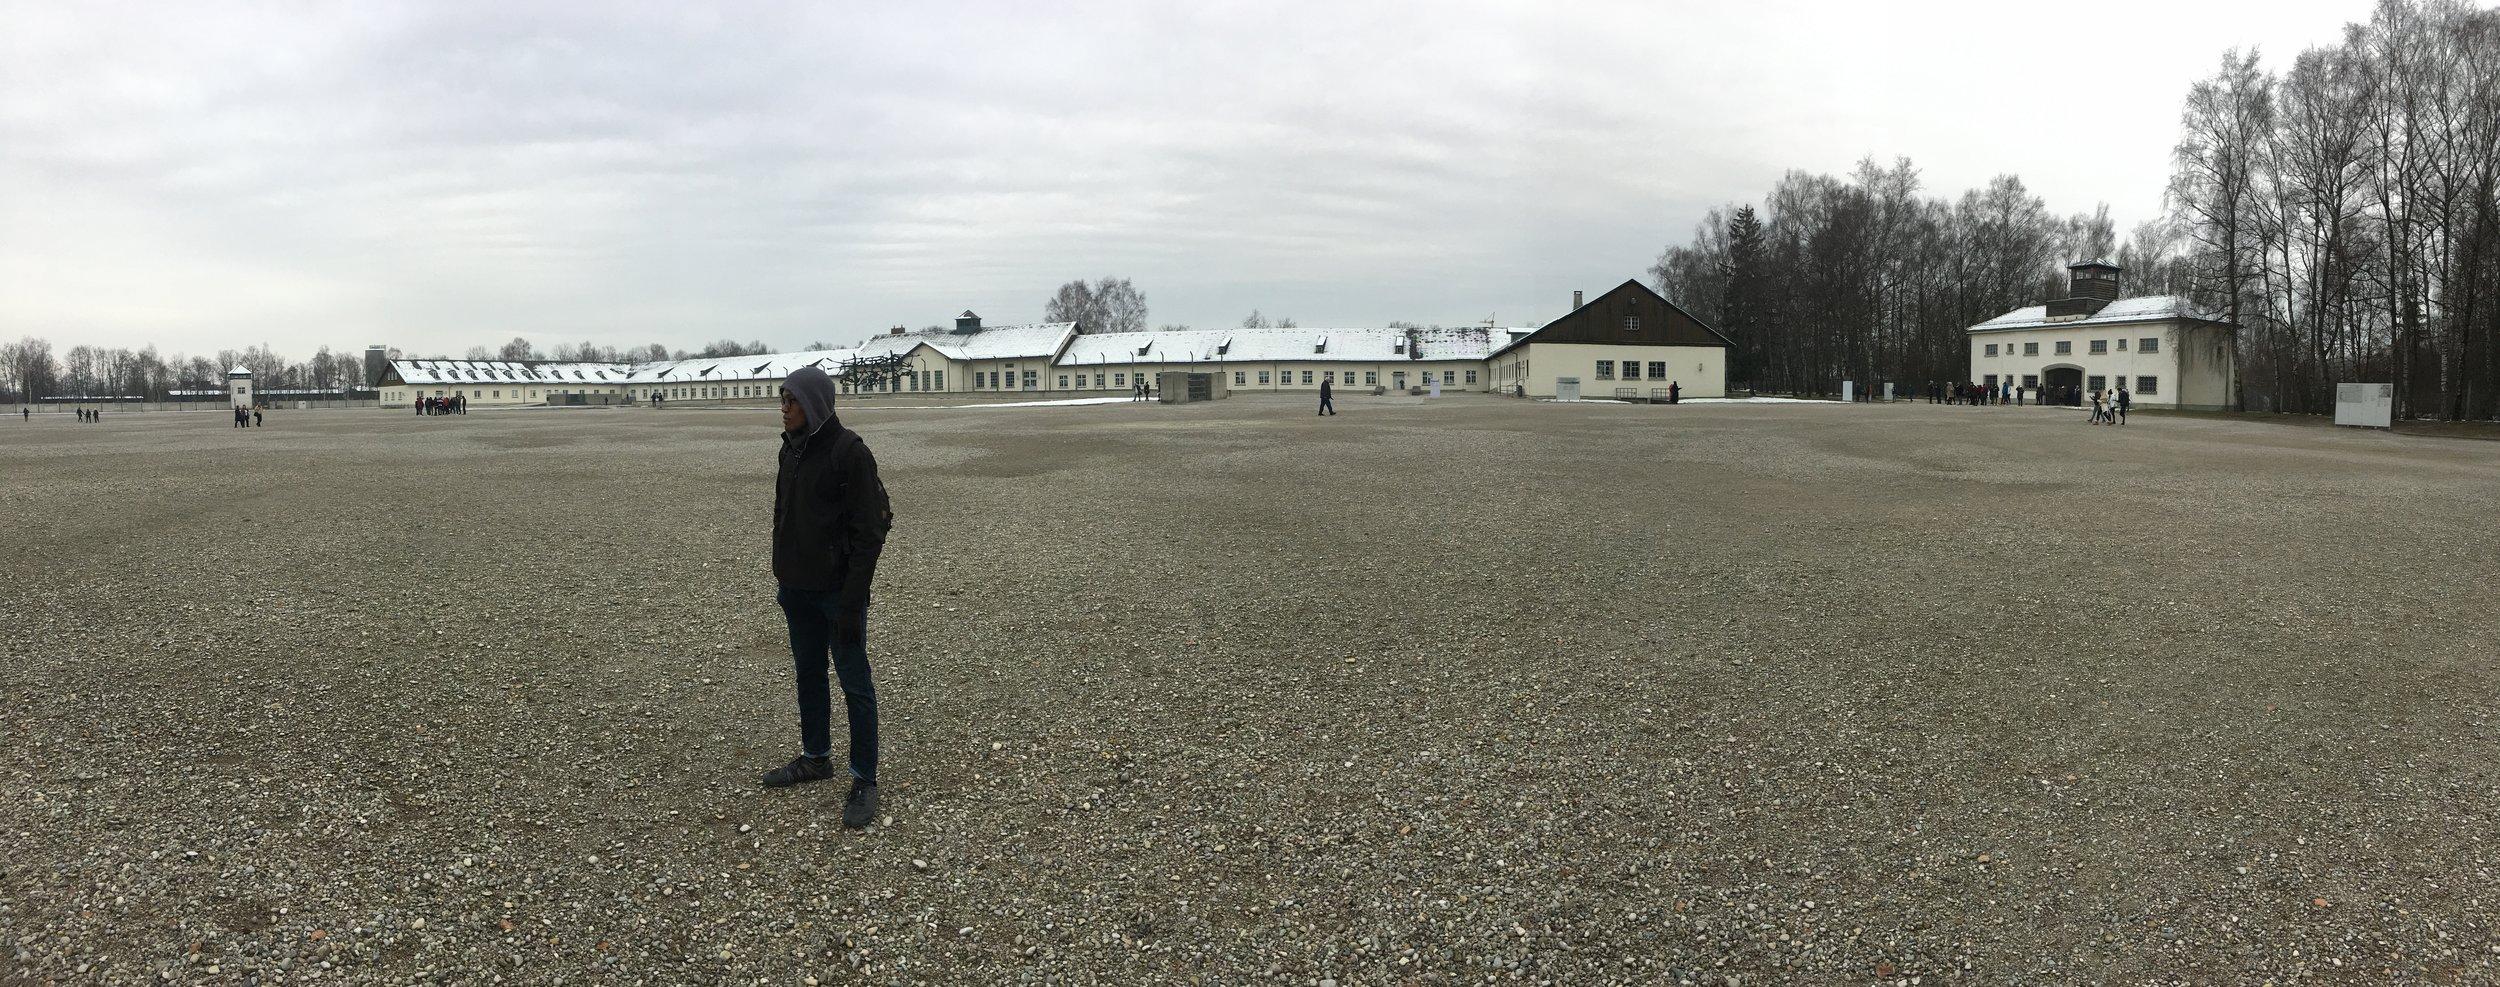 Dachau courtyard, photo by Pavel R.